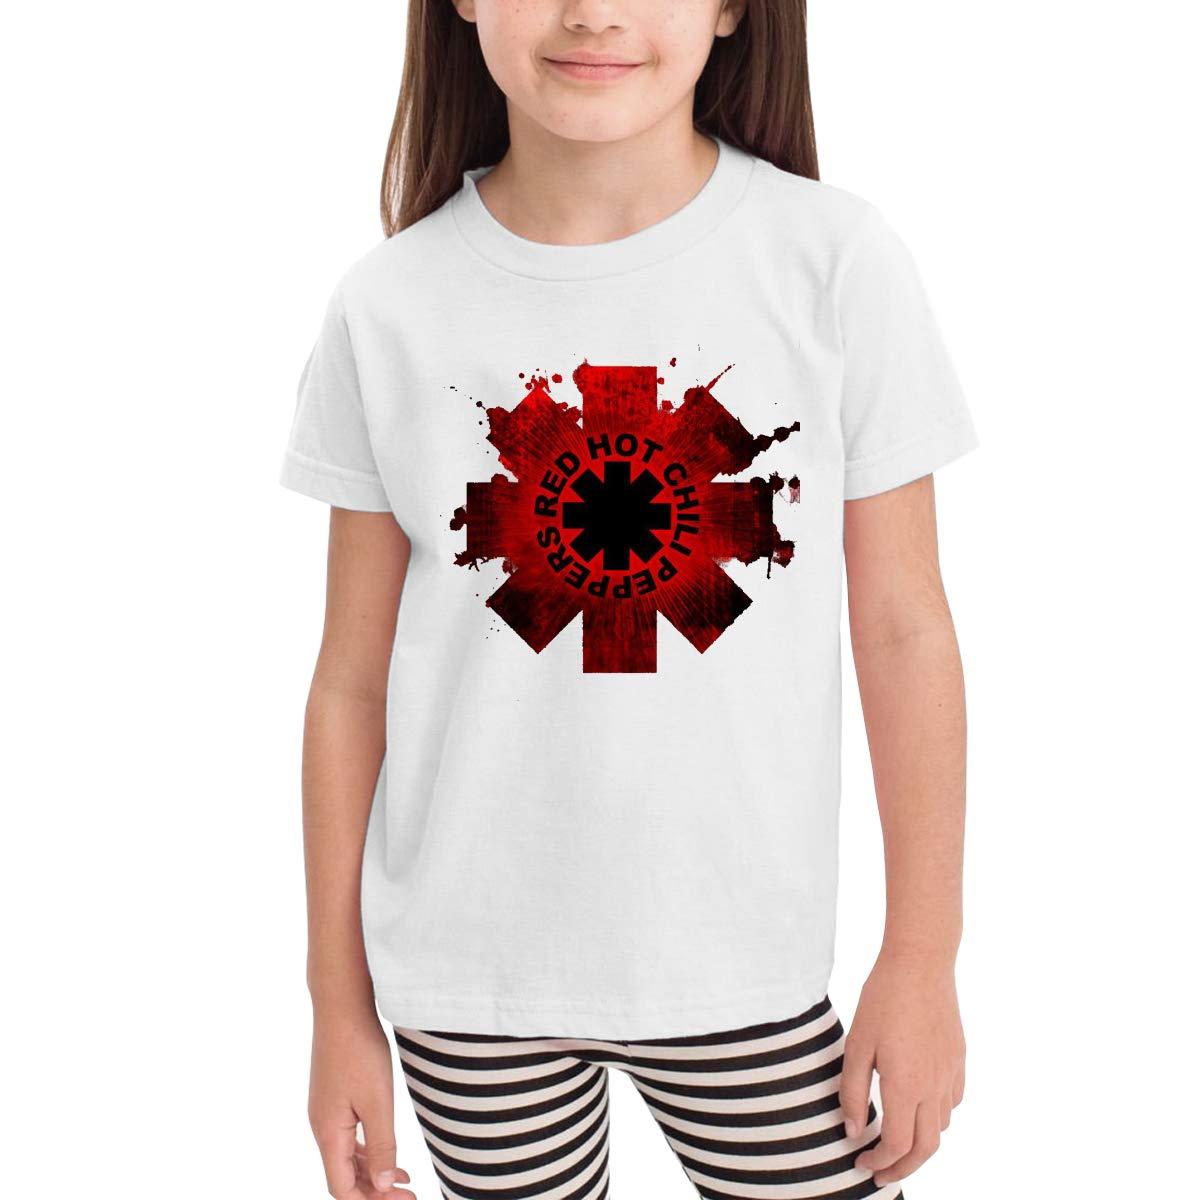 Marsherun Hot Chili Peppers Rock Band Logo Girls S Tee For Tops 1185 Shirts